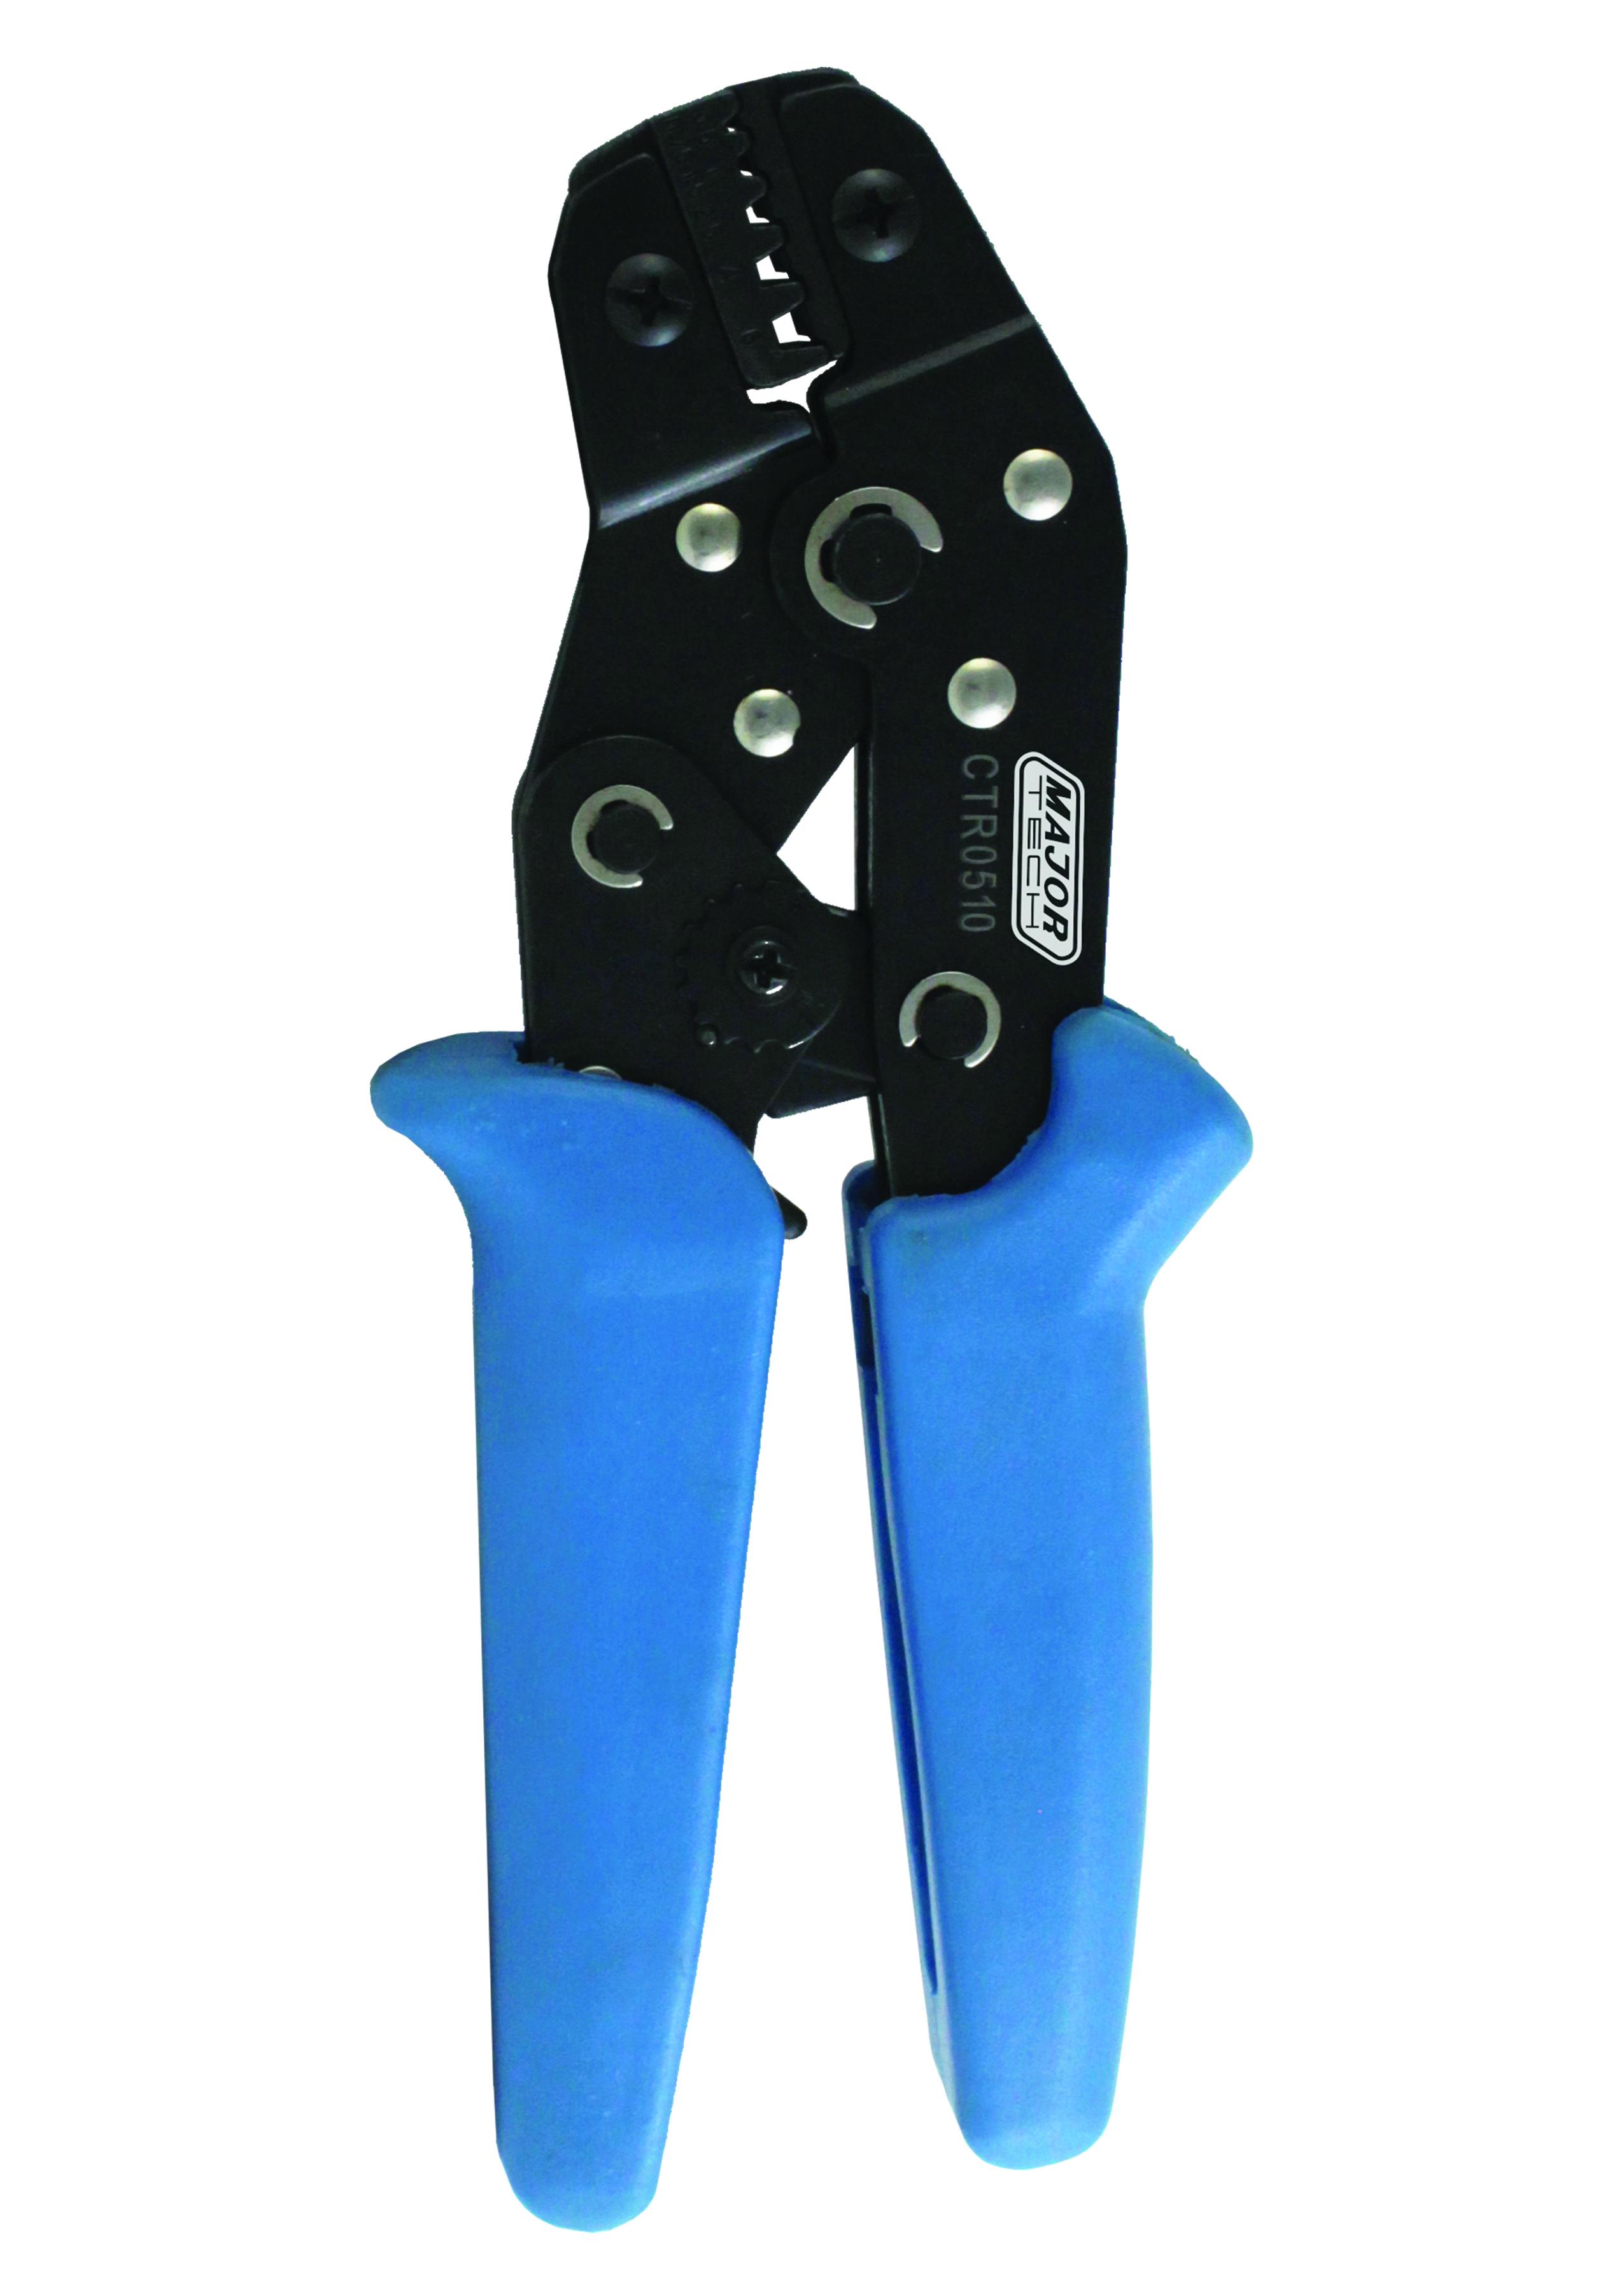 Bootlace Ferrule Crimping Tool (CTR0510) - Major Tech